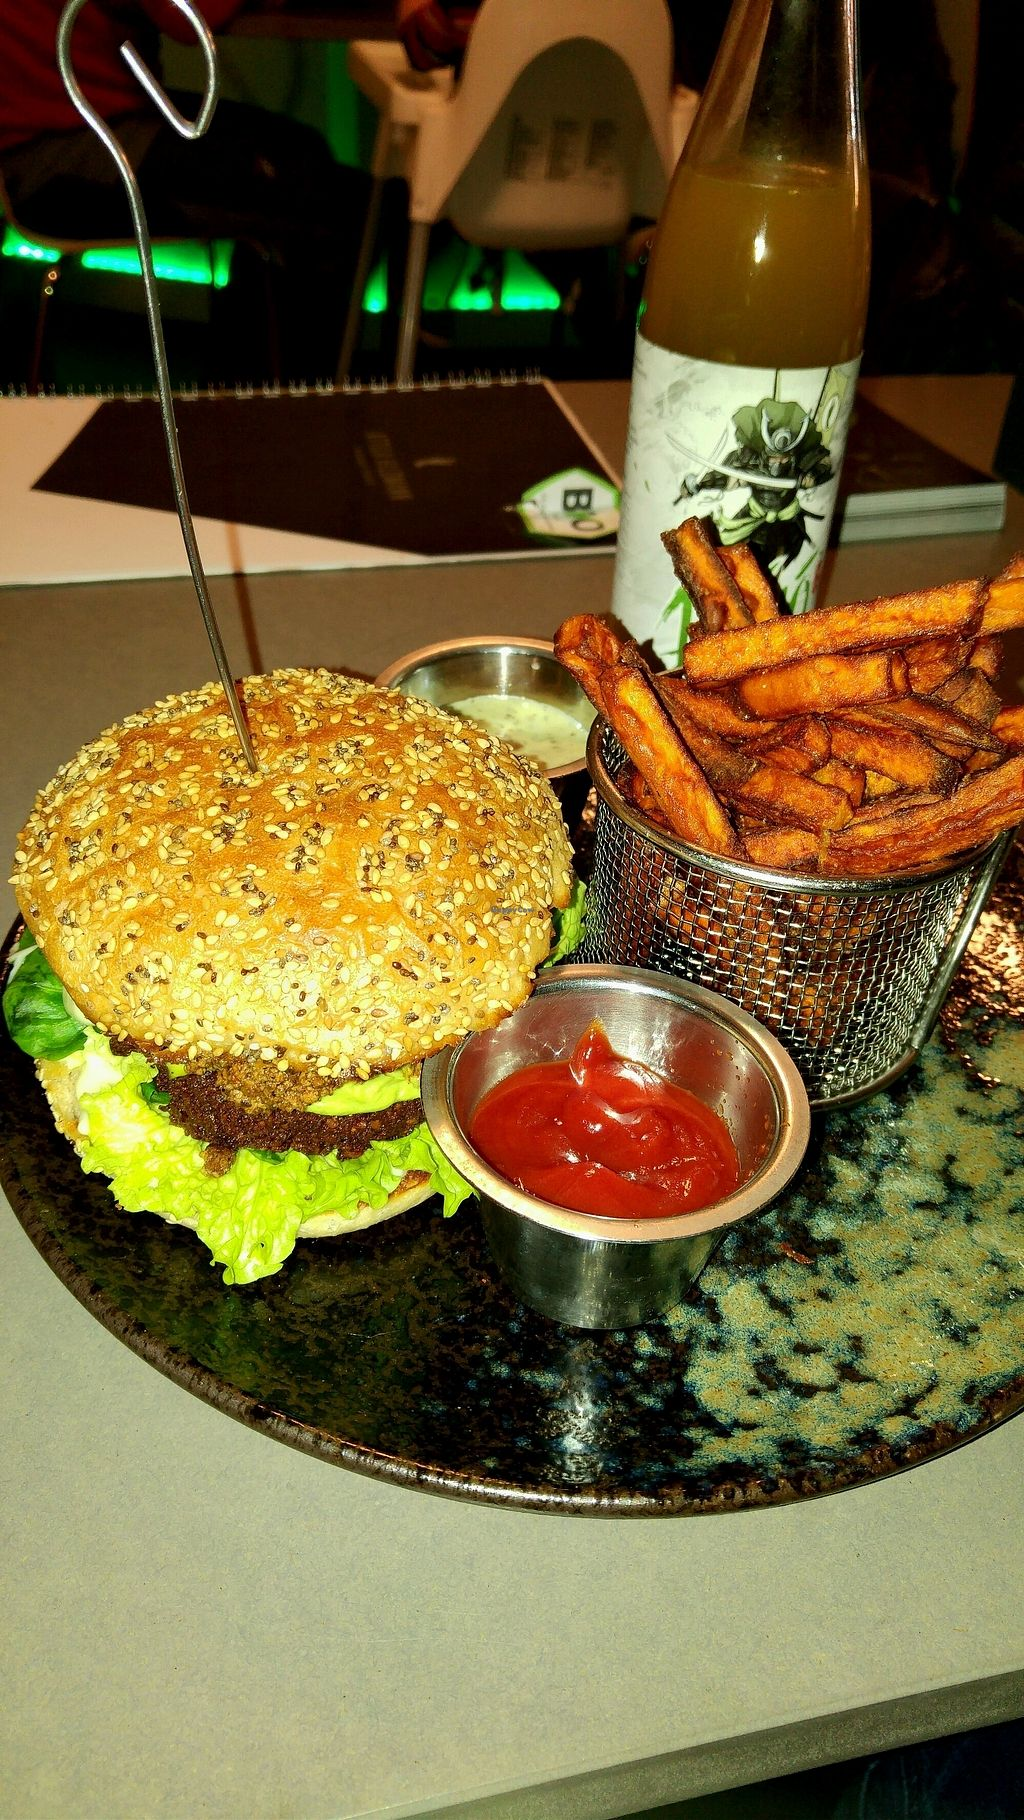 "Photo of Attila Hildmann Vegan Food  by <a href=""/members/profile/OmanFK"">OmanFK</a> <br/>(Big) chilli burger menü <br/> November 28, 2017  - <a href='/contact/abuse/image/91807/330021'>Report</a>"